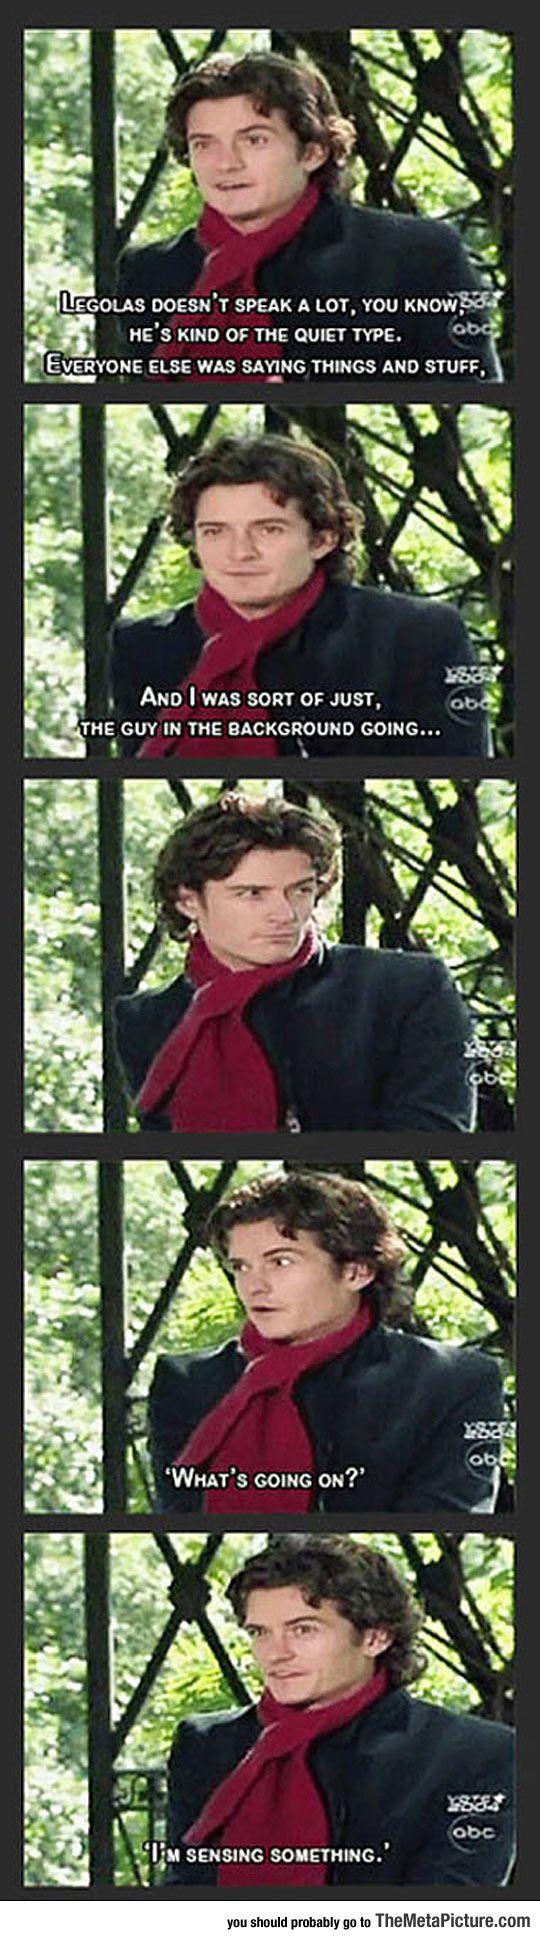 Legolas Doesn't Speak